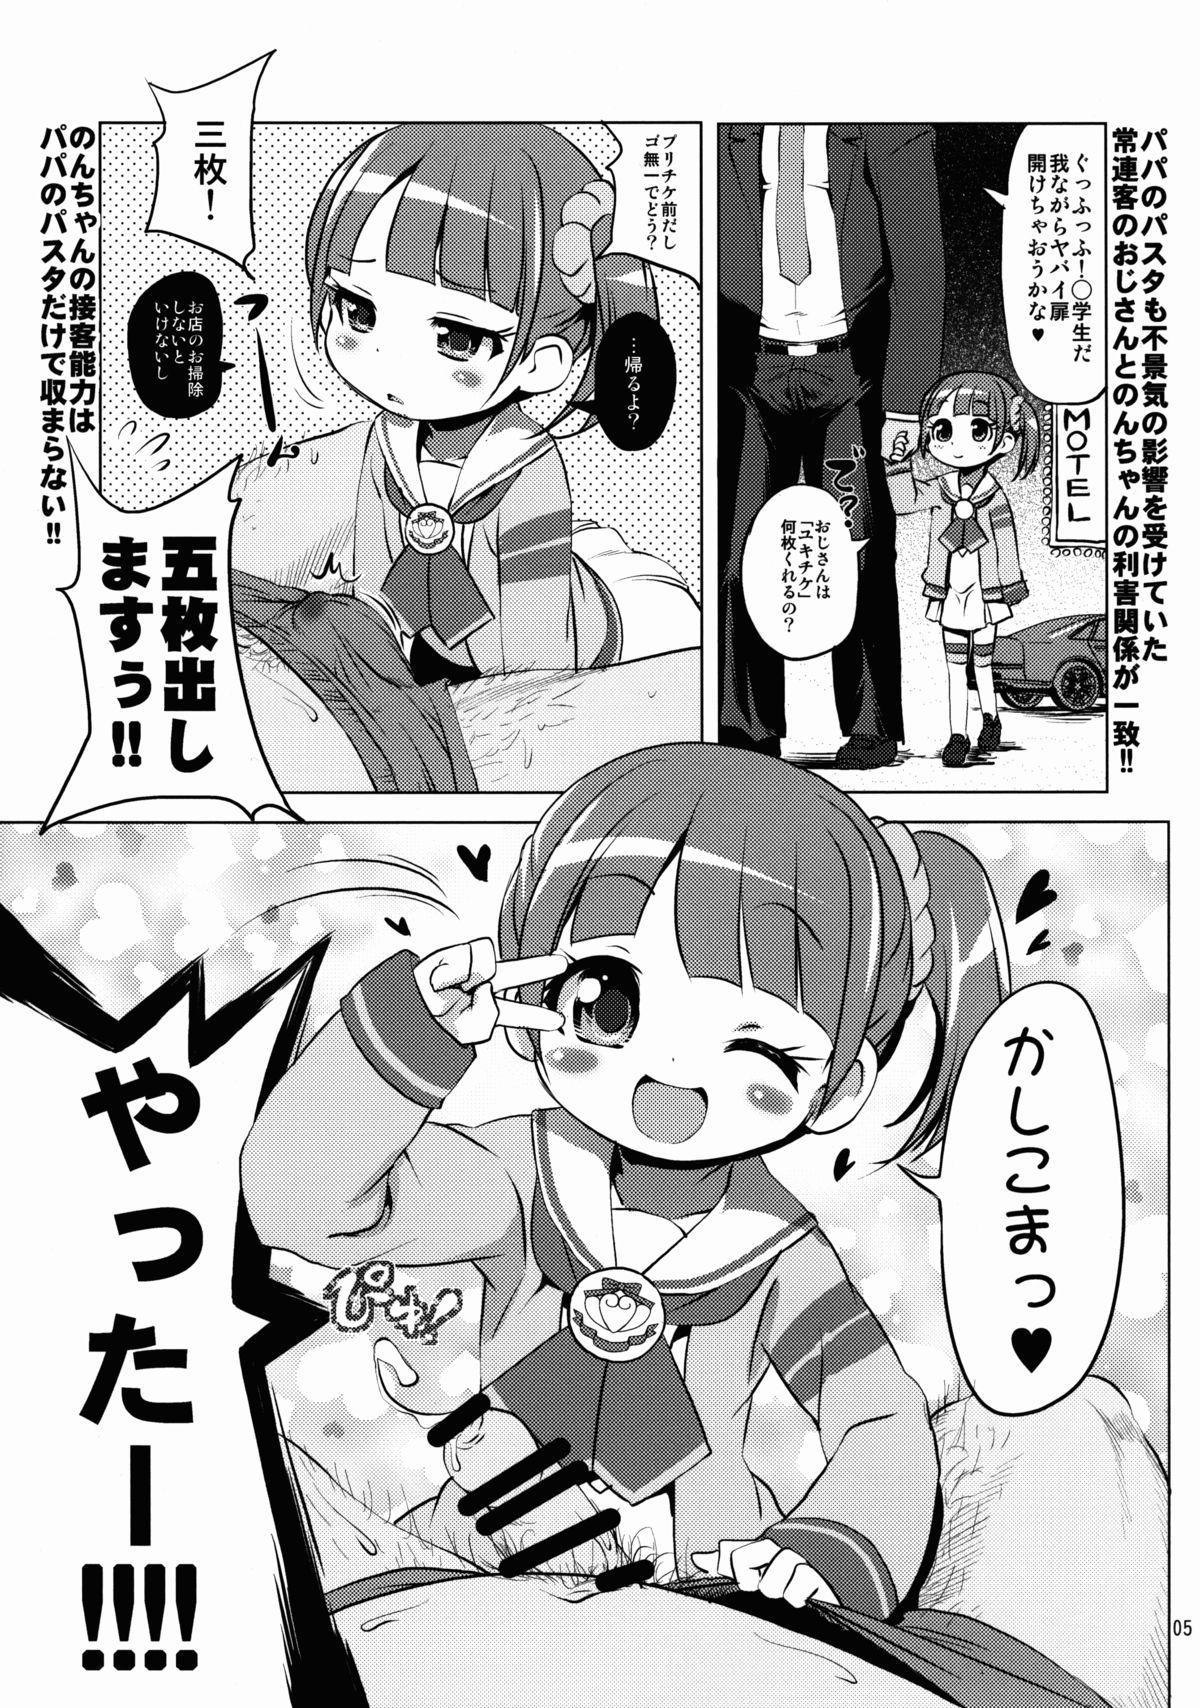 Yukichikepako tte Kashikoma! 4